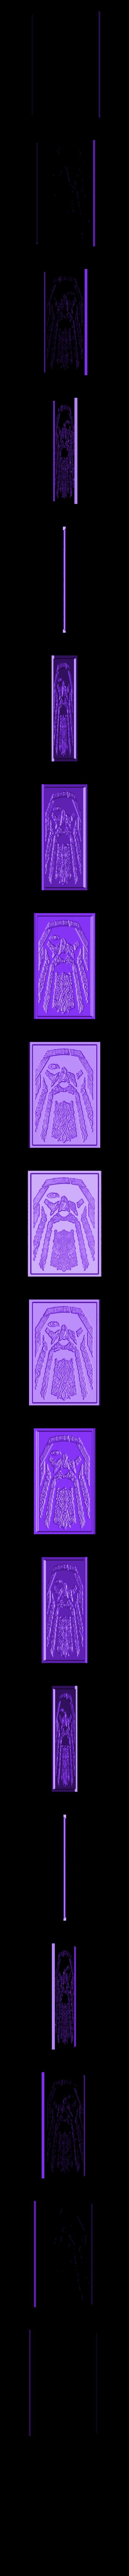 odin6.stl Download STL file odin 6 • 3D printing template, marctull297